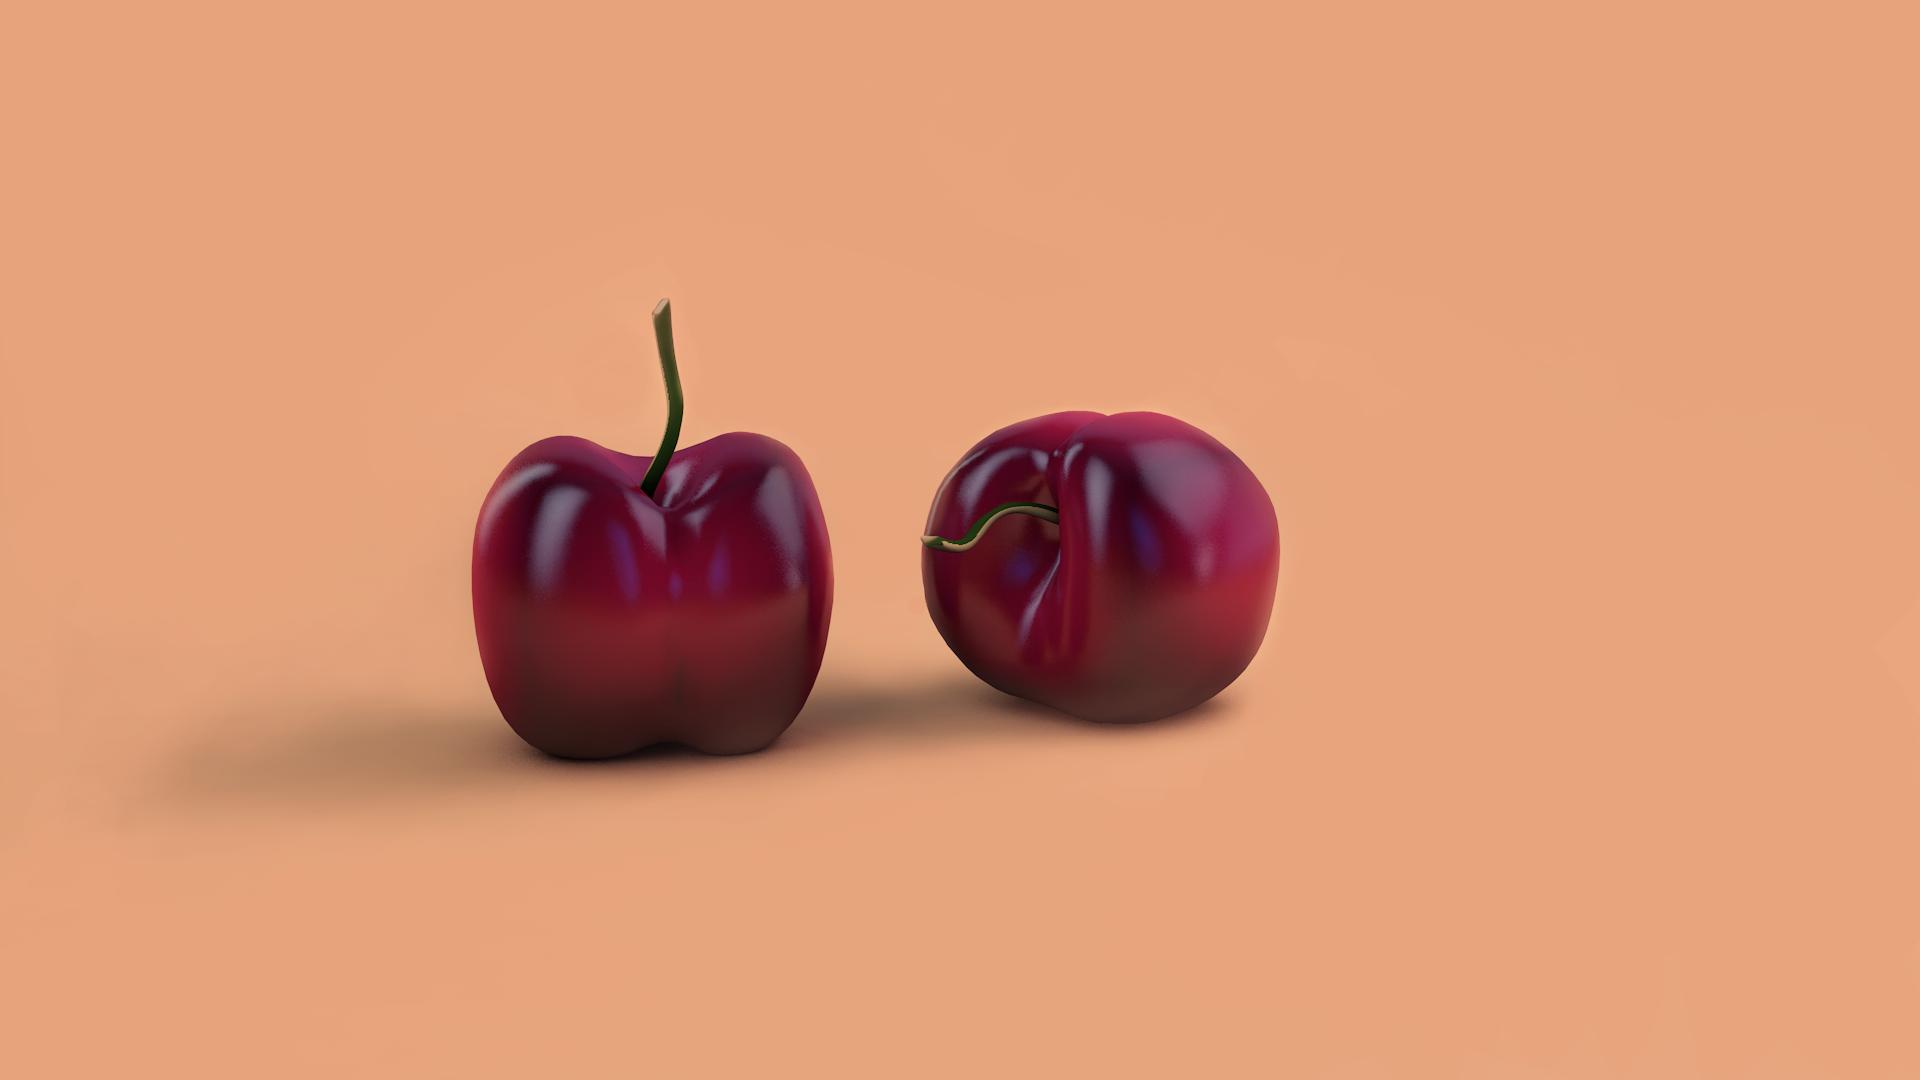 cherryedited+copy